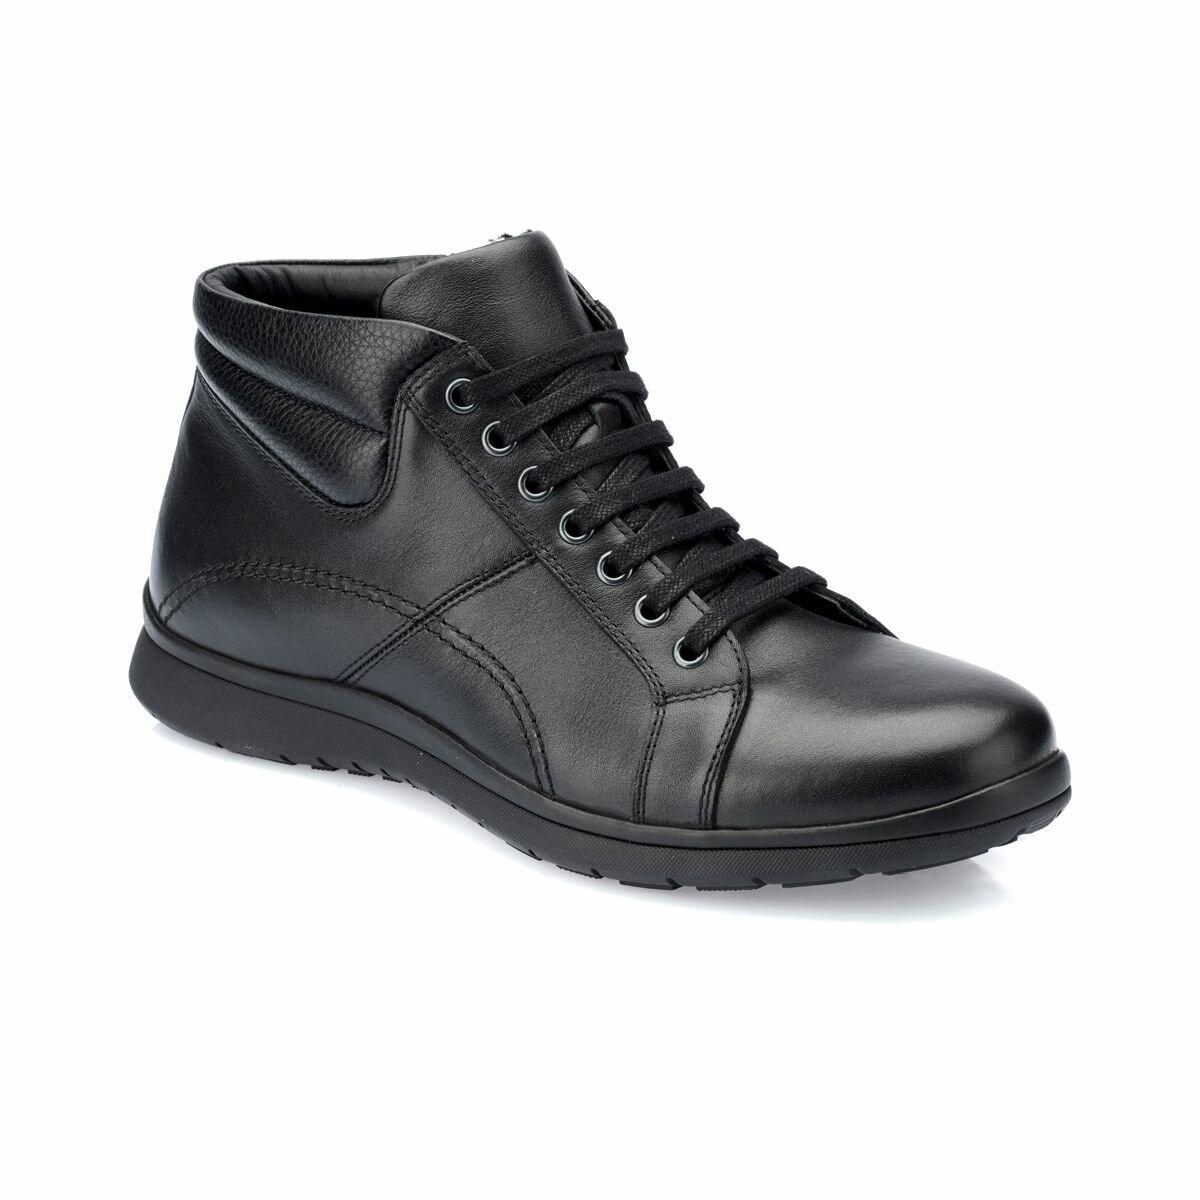 Flo 82.100619.m preto sapatos masculinos polaris 5 ponto